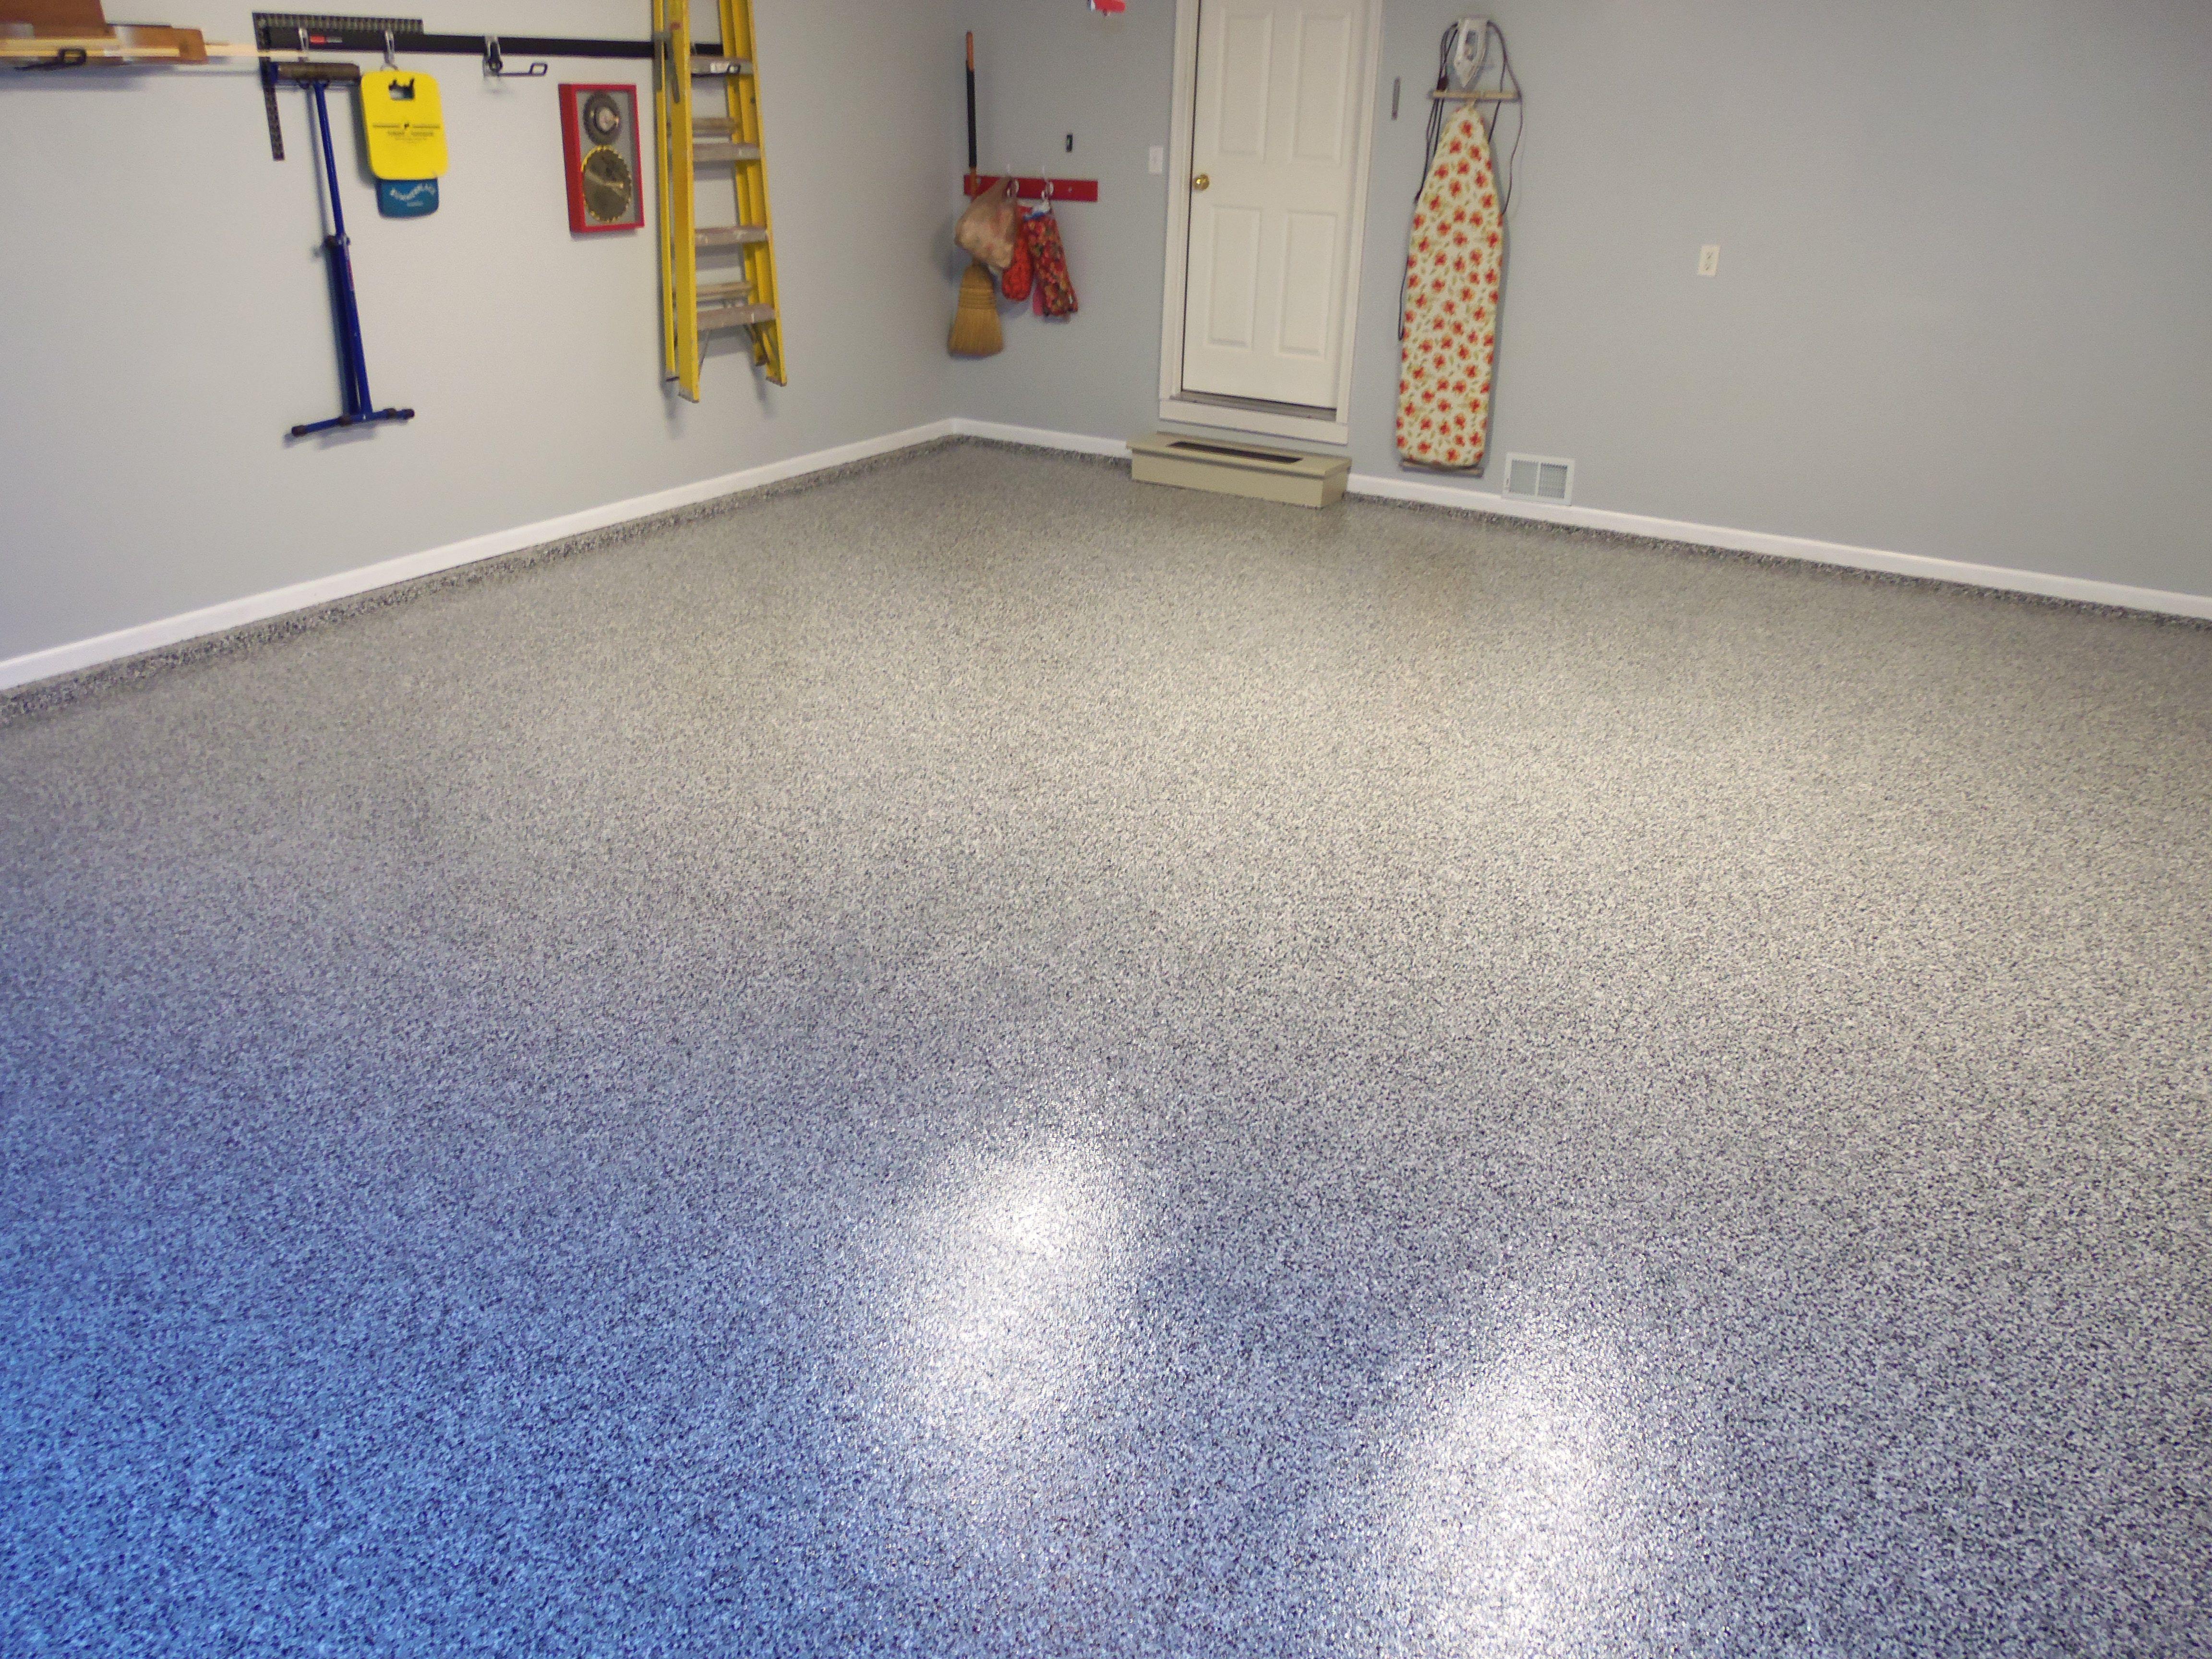 Epoxy garage floor by RyanCo (Stonehenge is the color